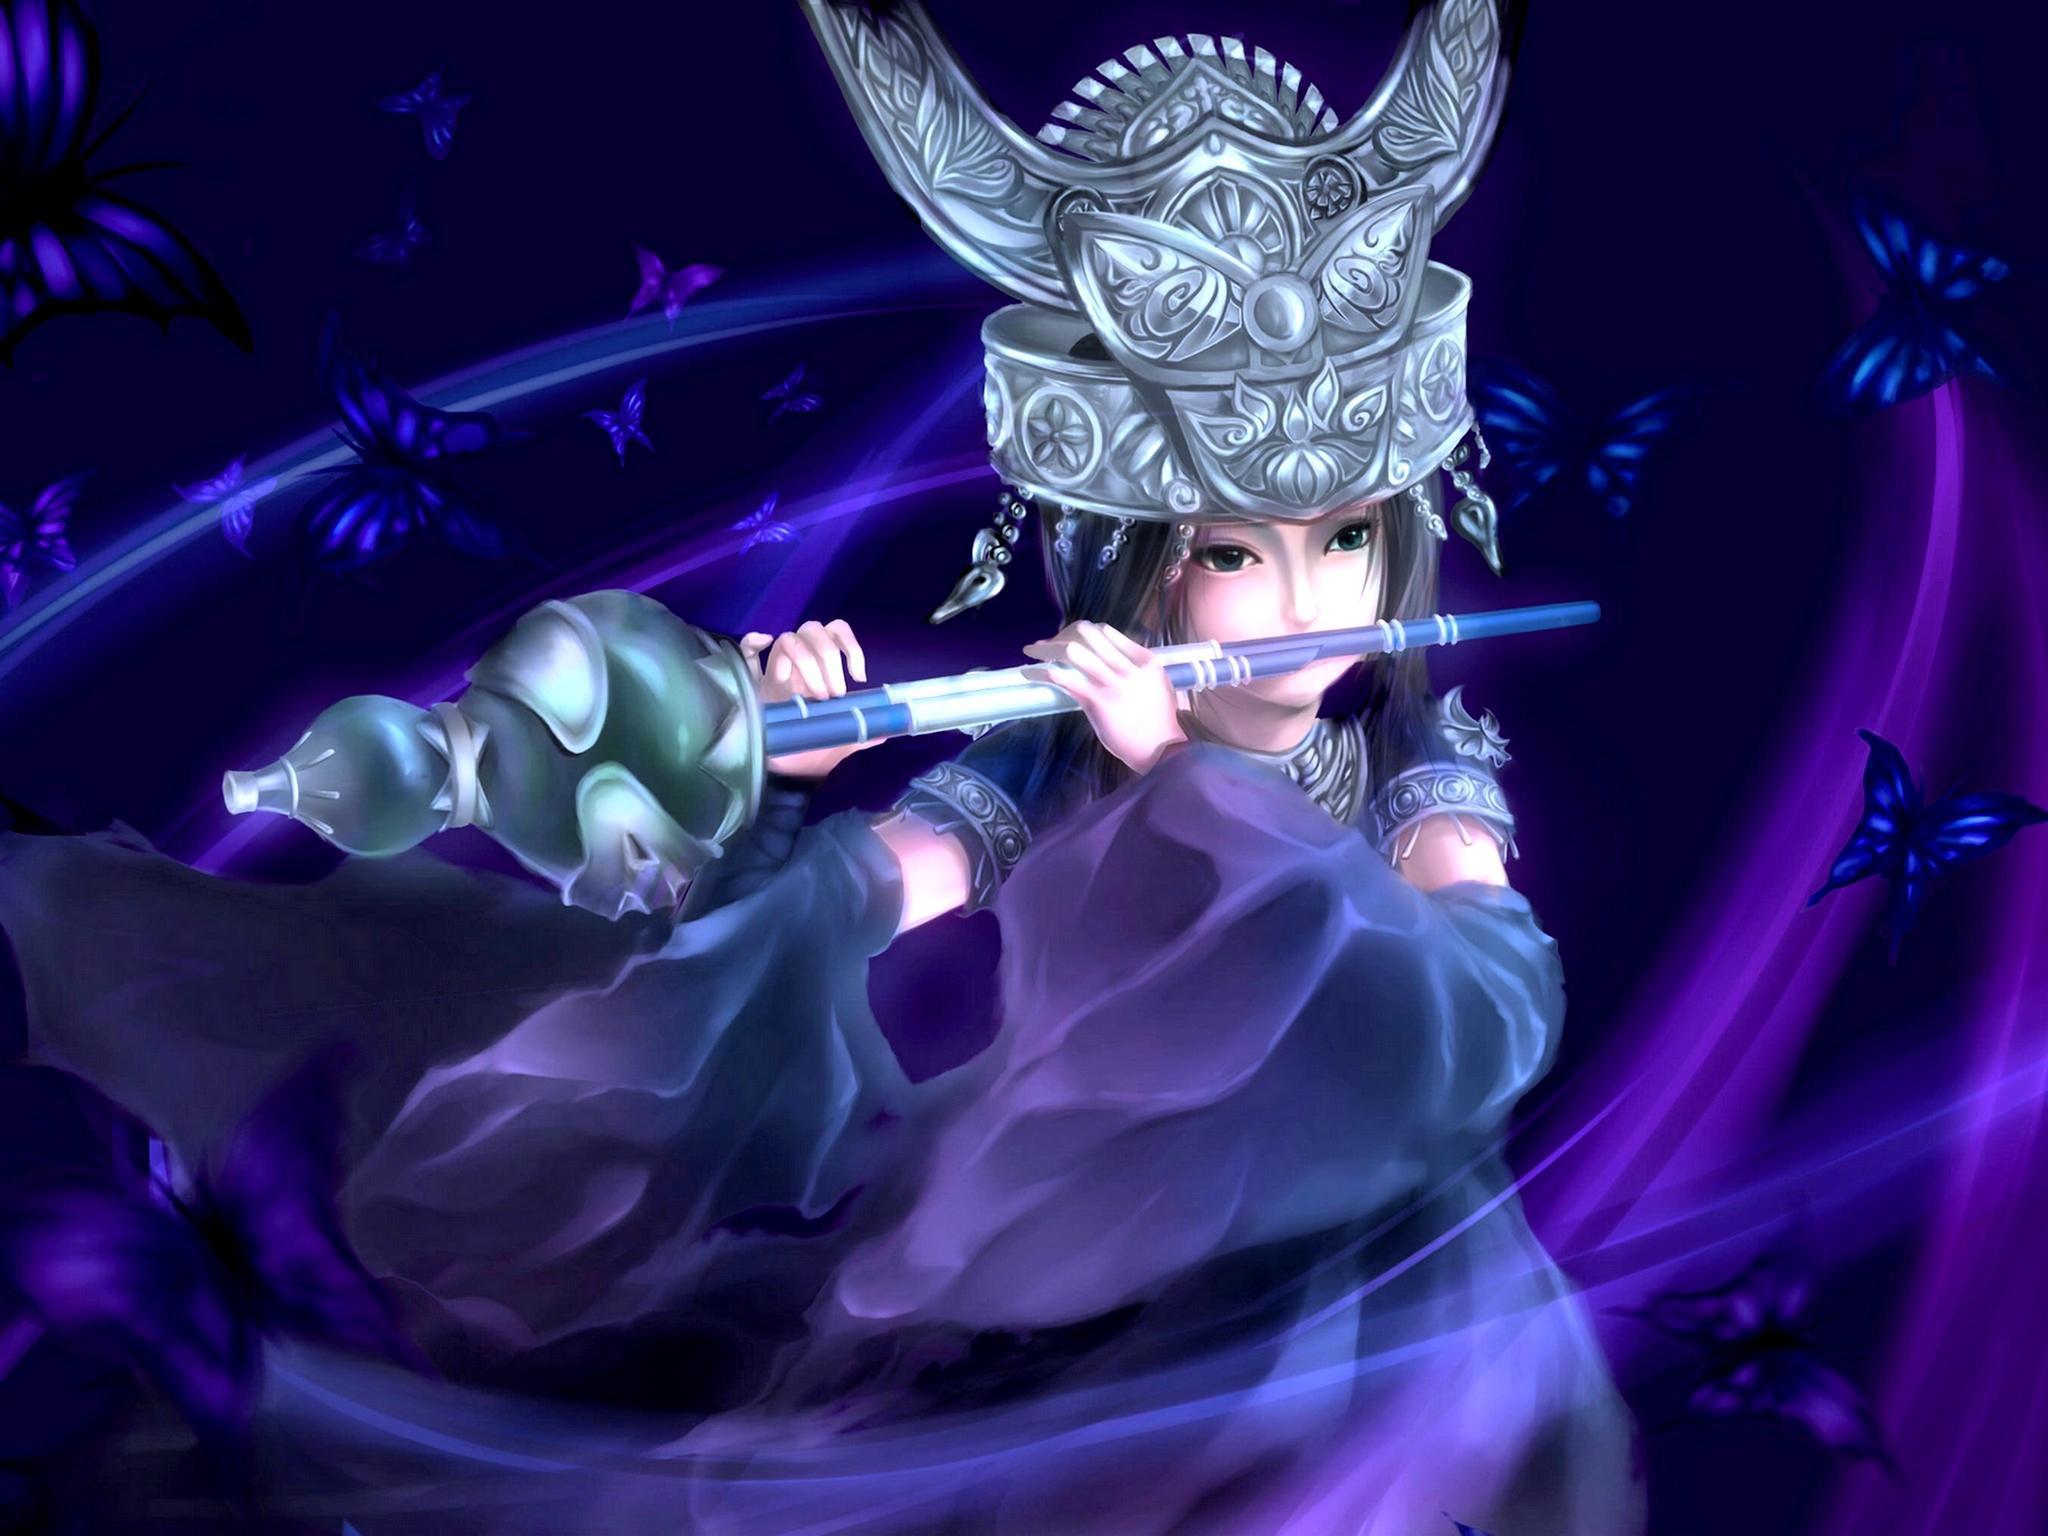 Download 2048x1536 Flute Girl wallpaper